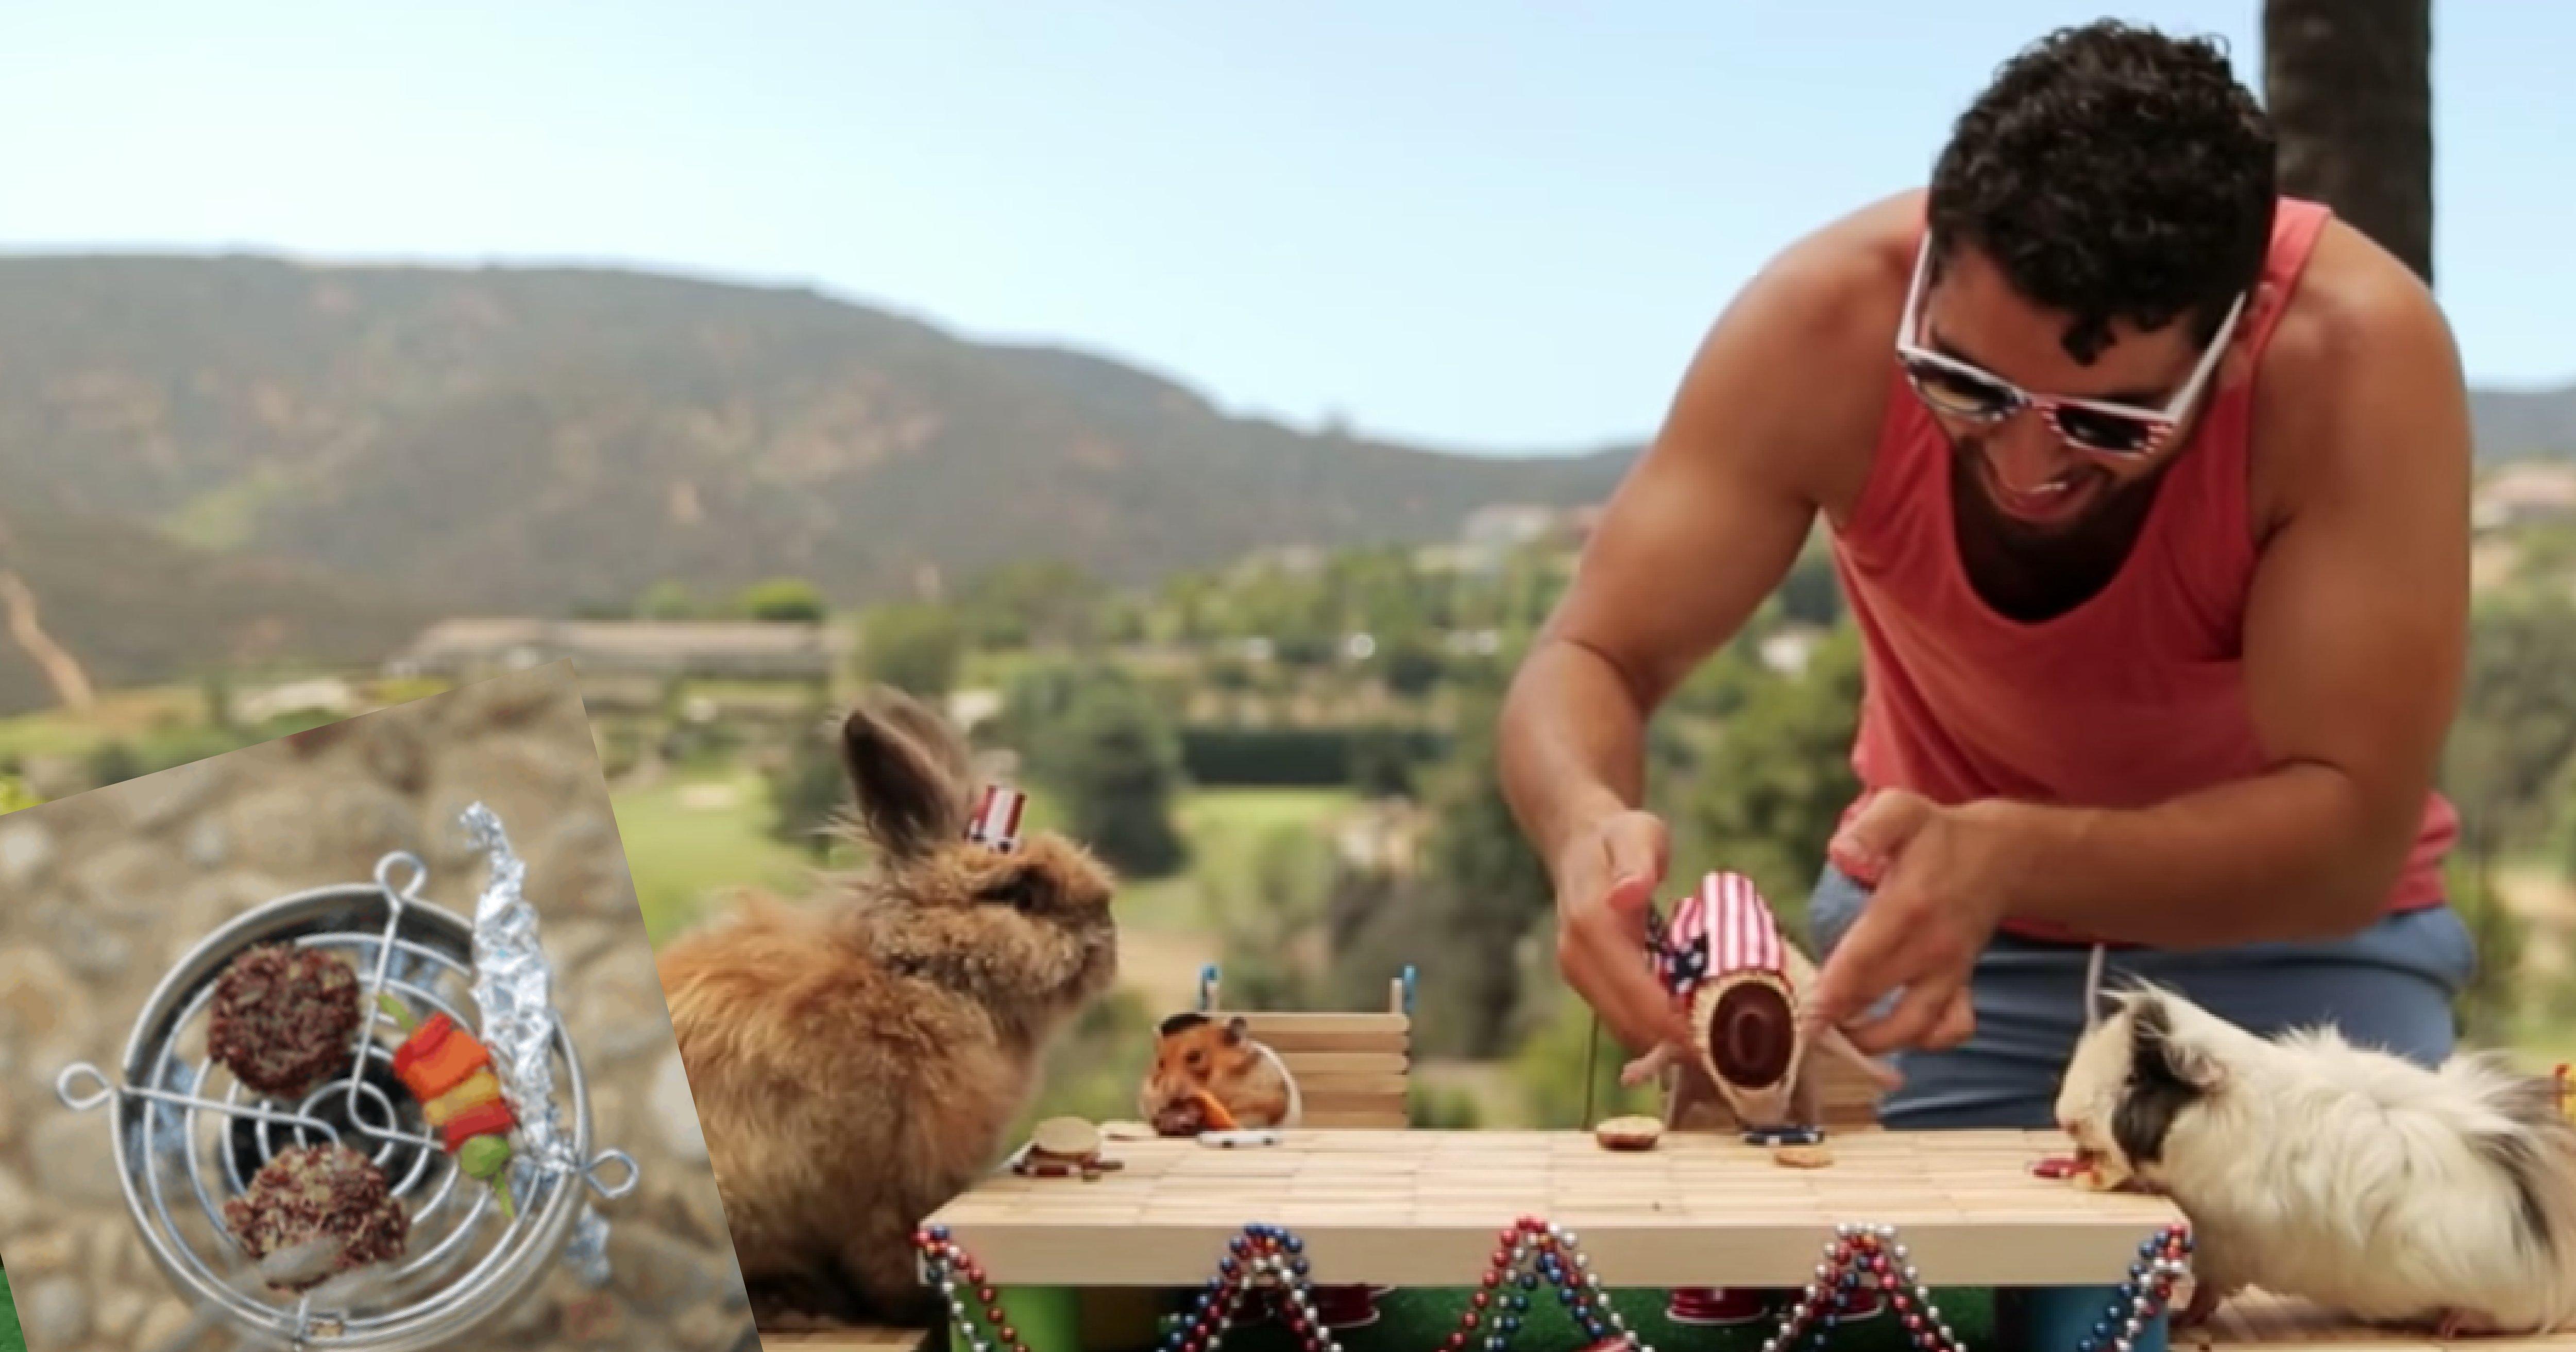 vonvone5b081e99da2 01 2.png?resize=300,169 - 【療癒影片】倉鼠、刺蝟、兔兔一起開趴,主人巧手製作「超迷你BBQ」萌到融化!